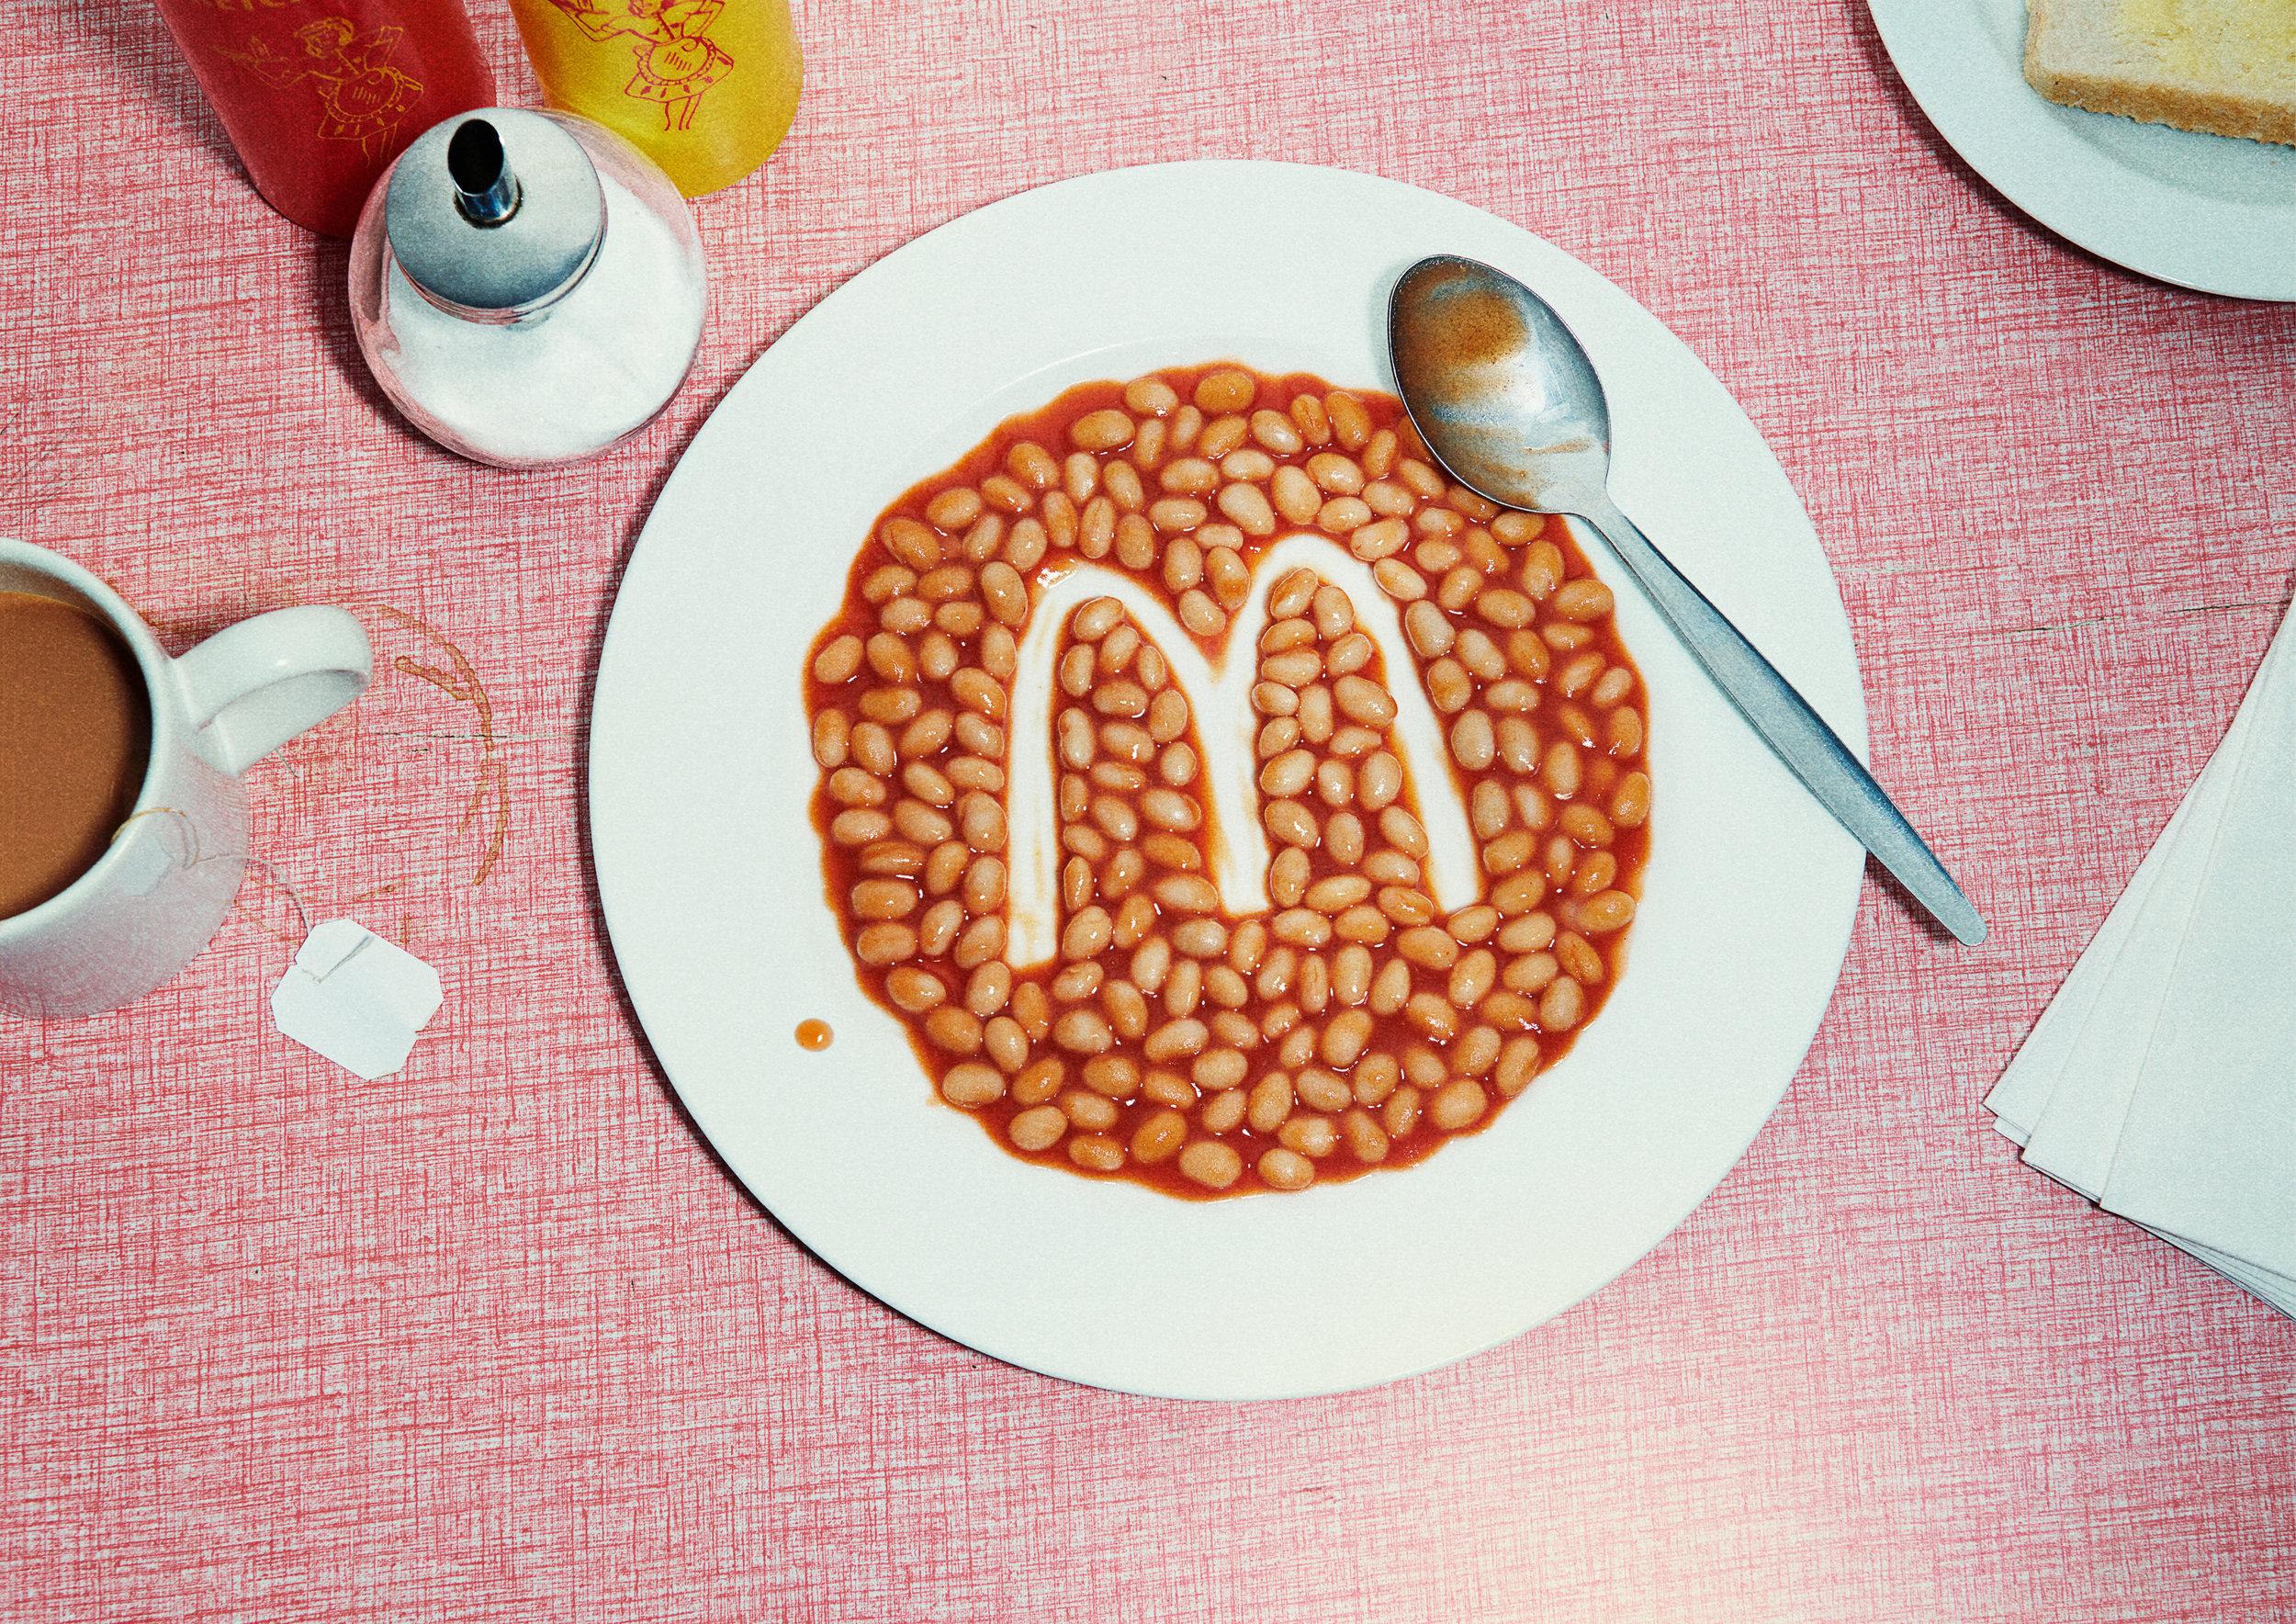 McDonald_s_Beans.jpg